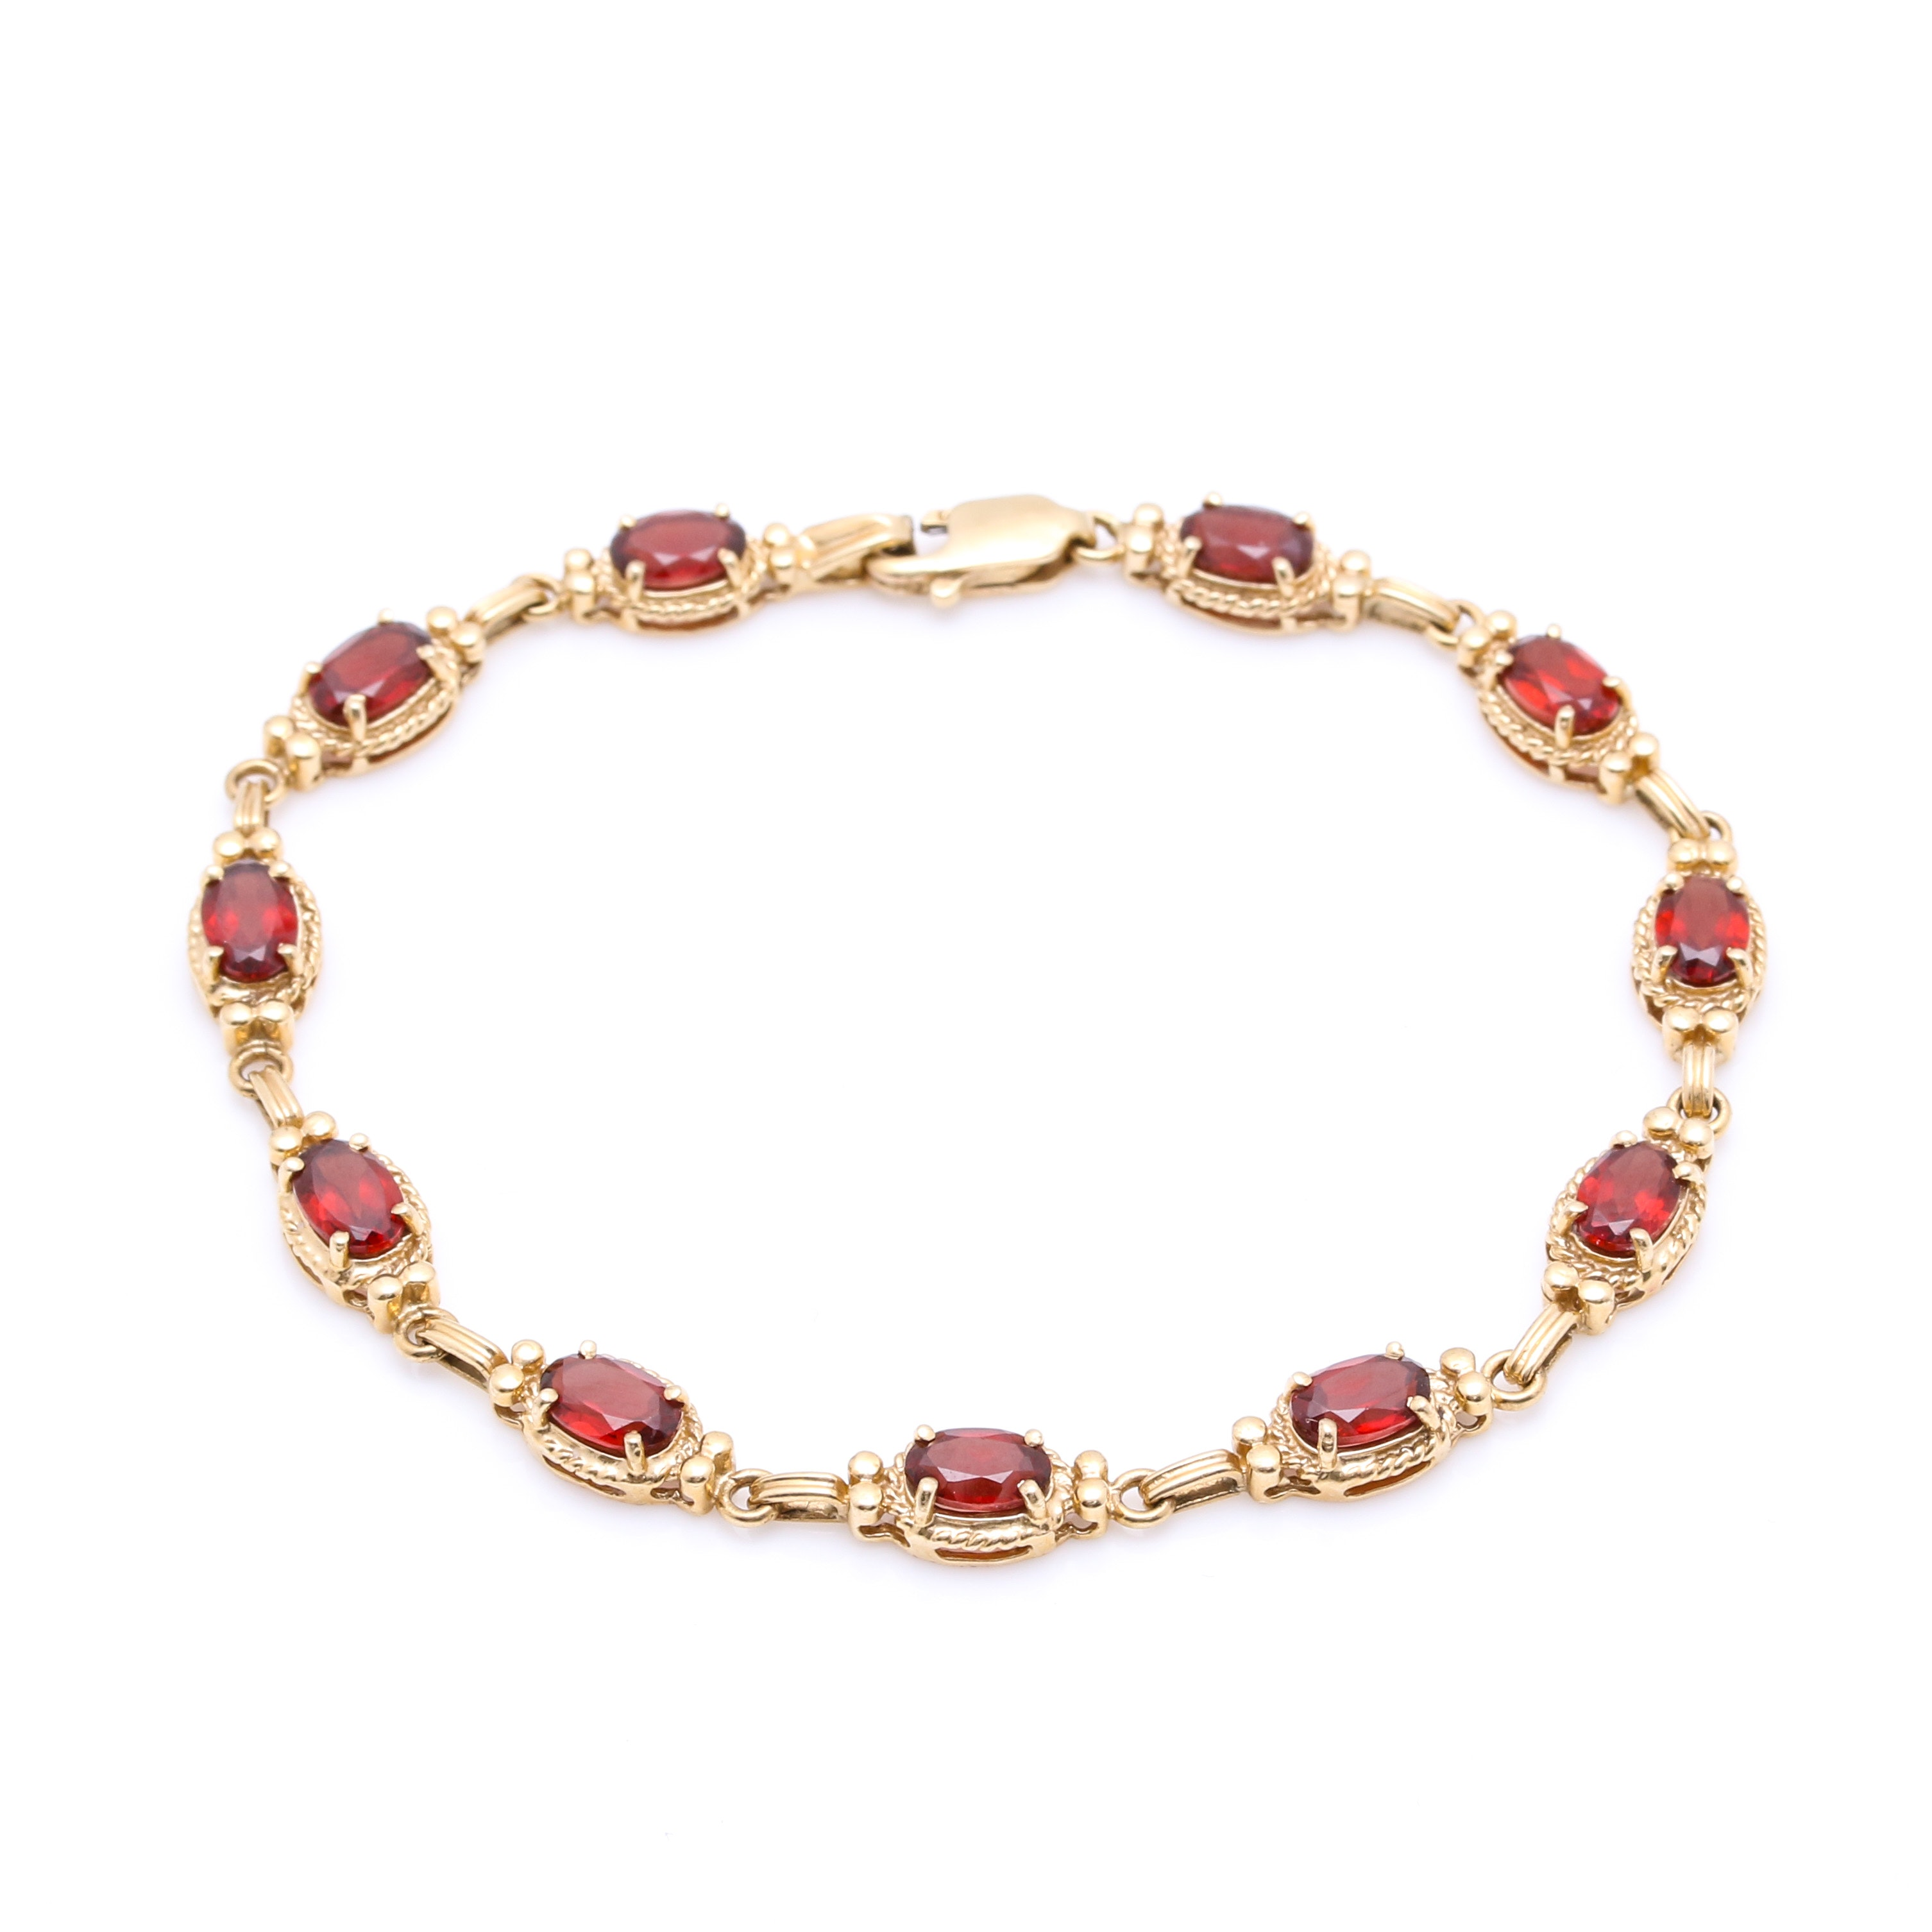 14K Yellow Gold and Garnet Bracelet